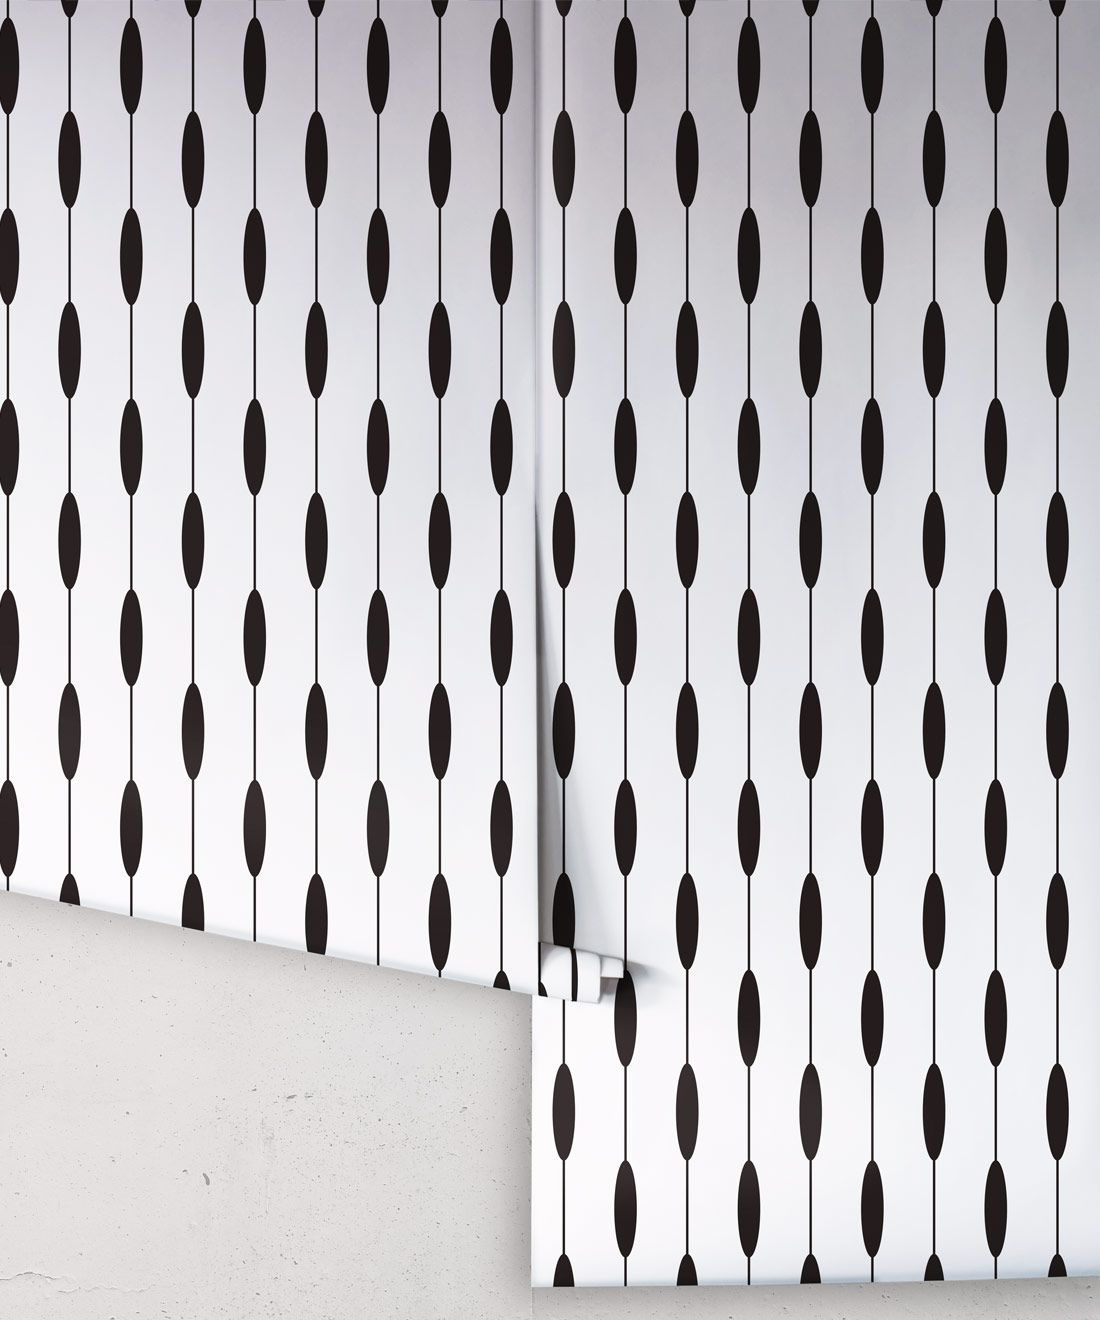 Bowline Wallpaper • Geometric Wallpaper • Striped Wallpaper • Black & White Wallpaper •Rolls